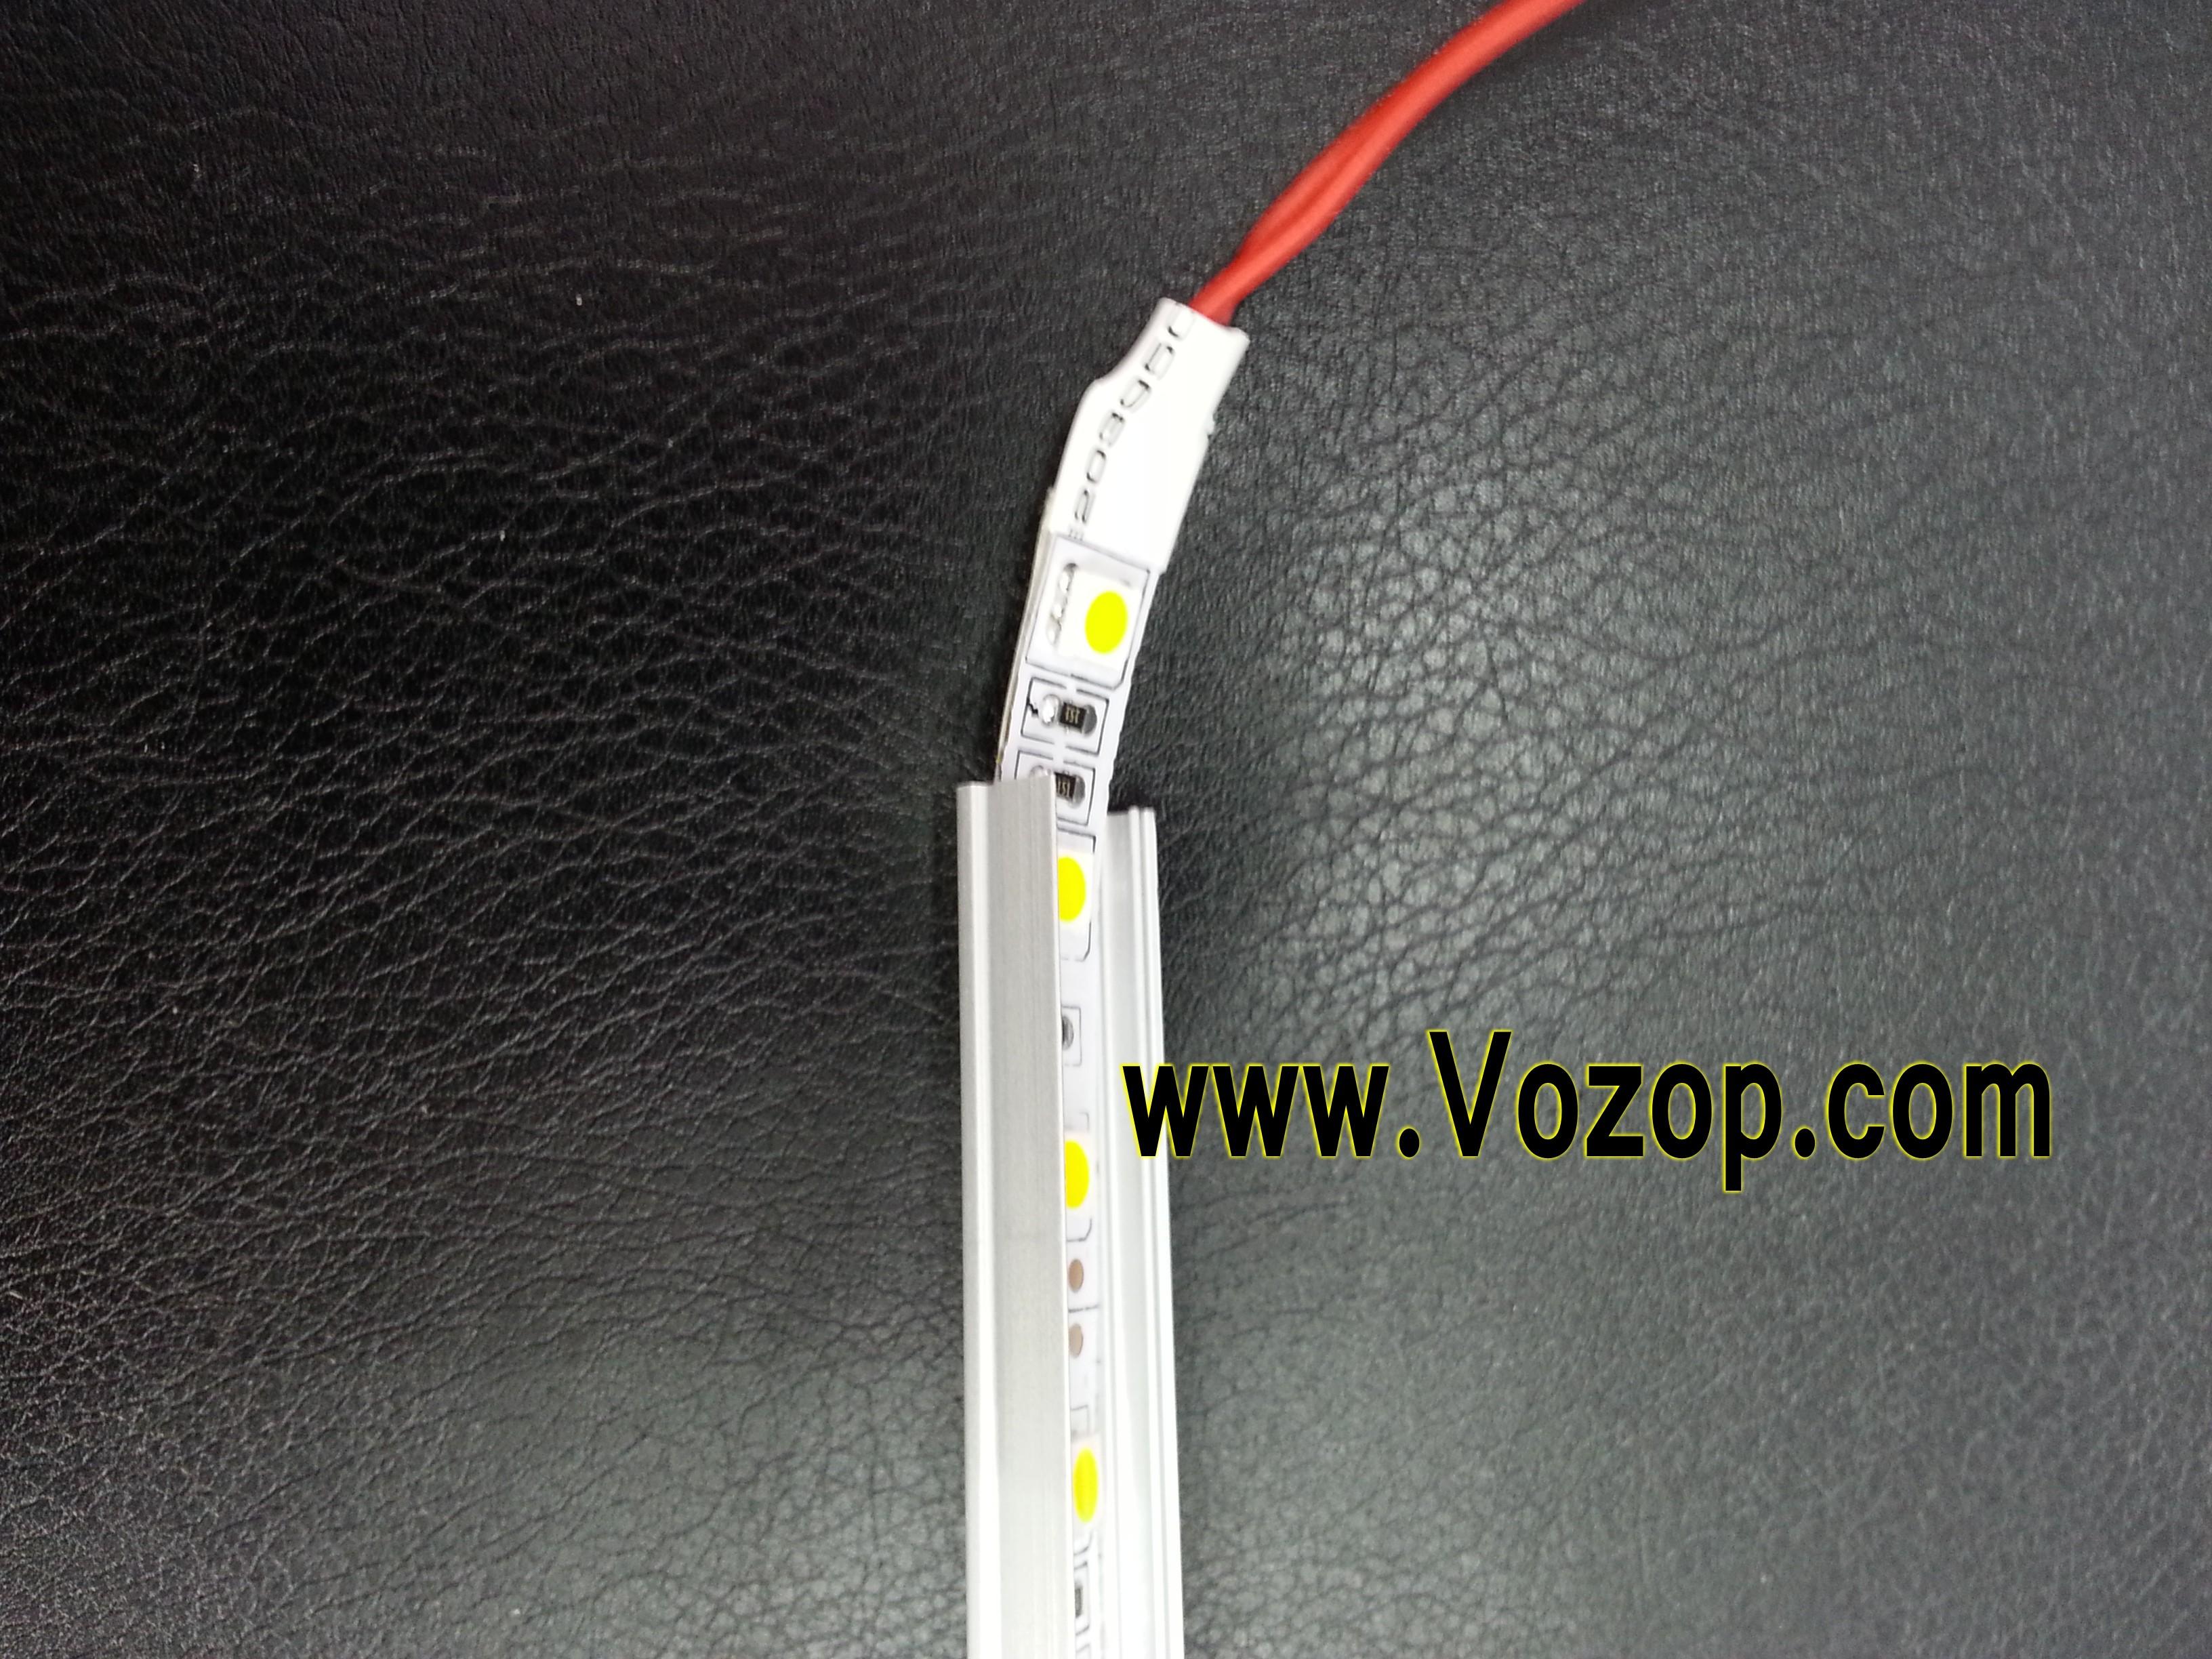 Micro_Aluminum_Channel_for_10mm_LED_Light_Strip